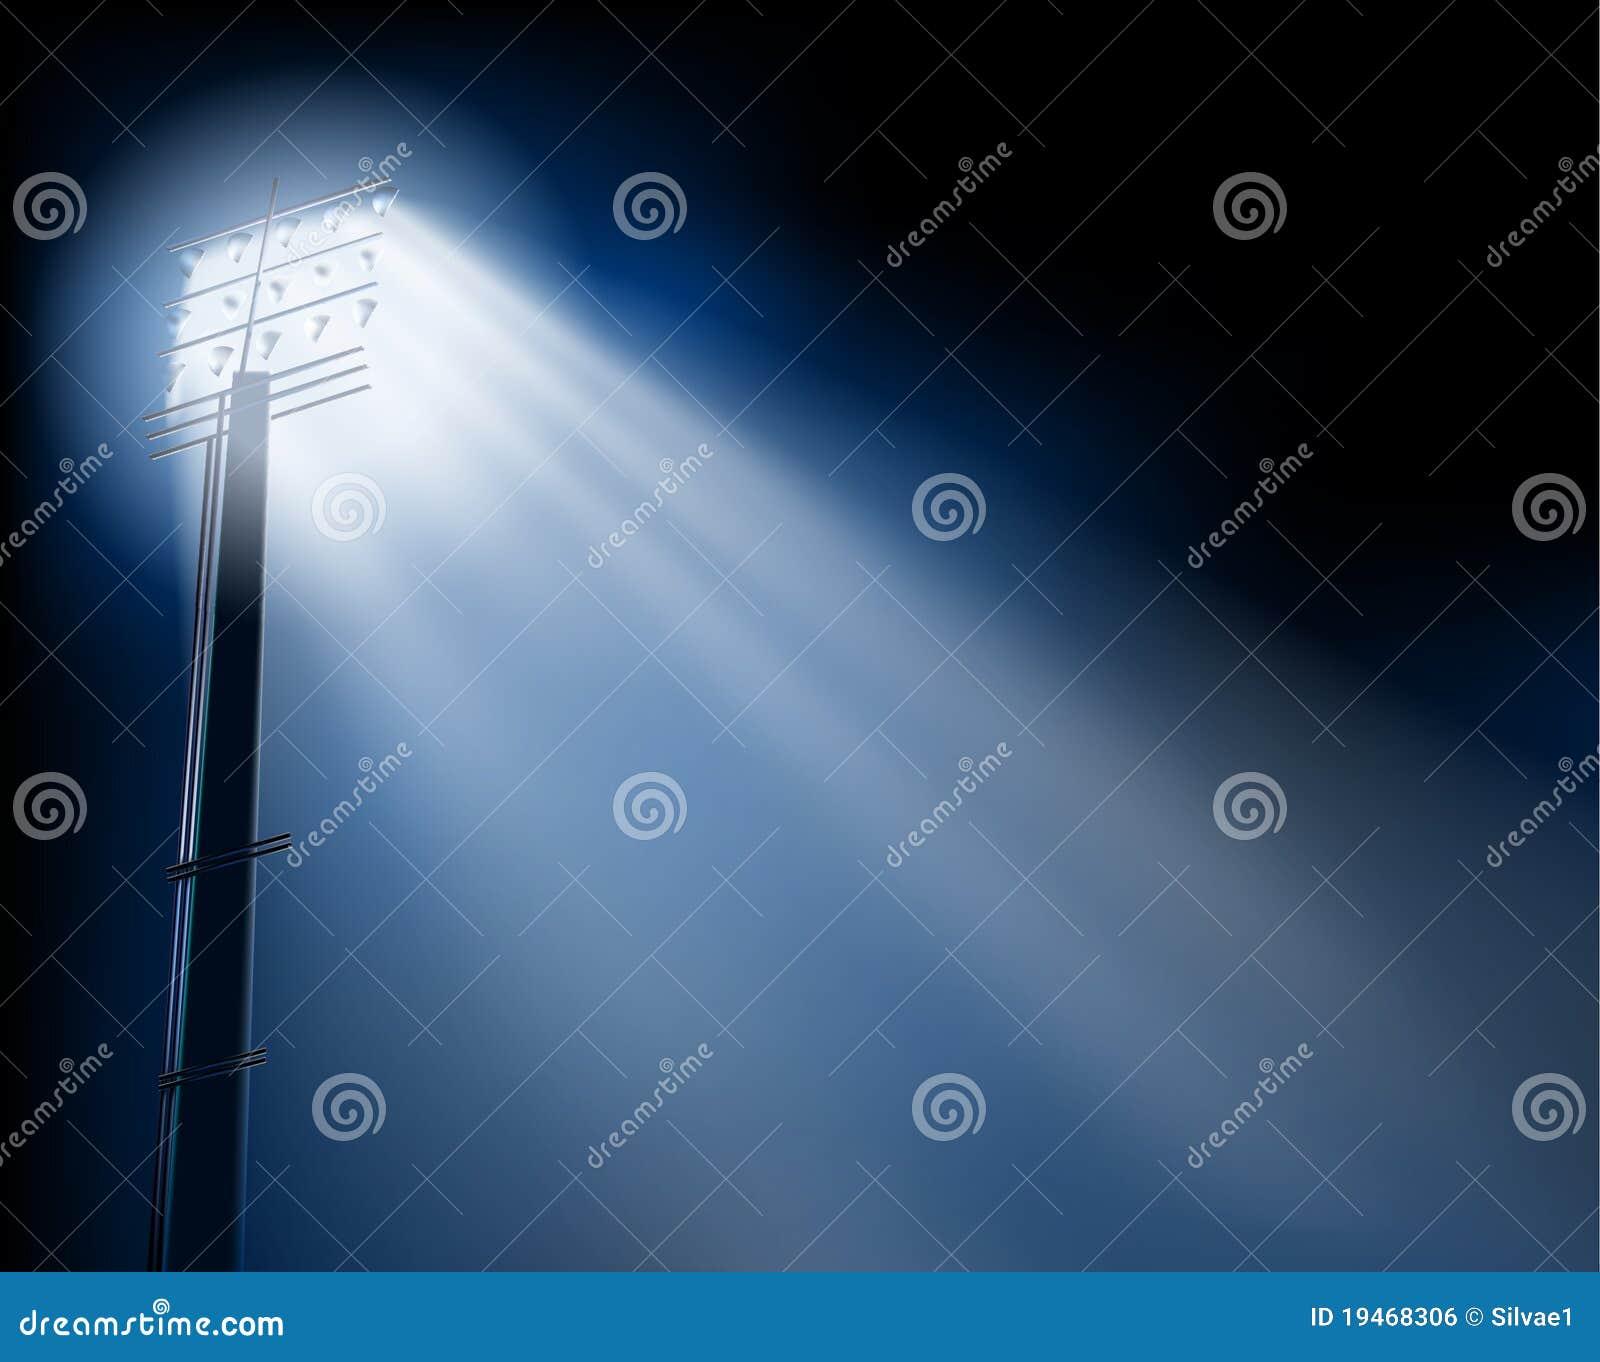 Stadium Lights Svg: Stadium Spotlights Royalty Free Stock Image